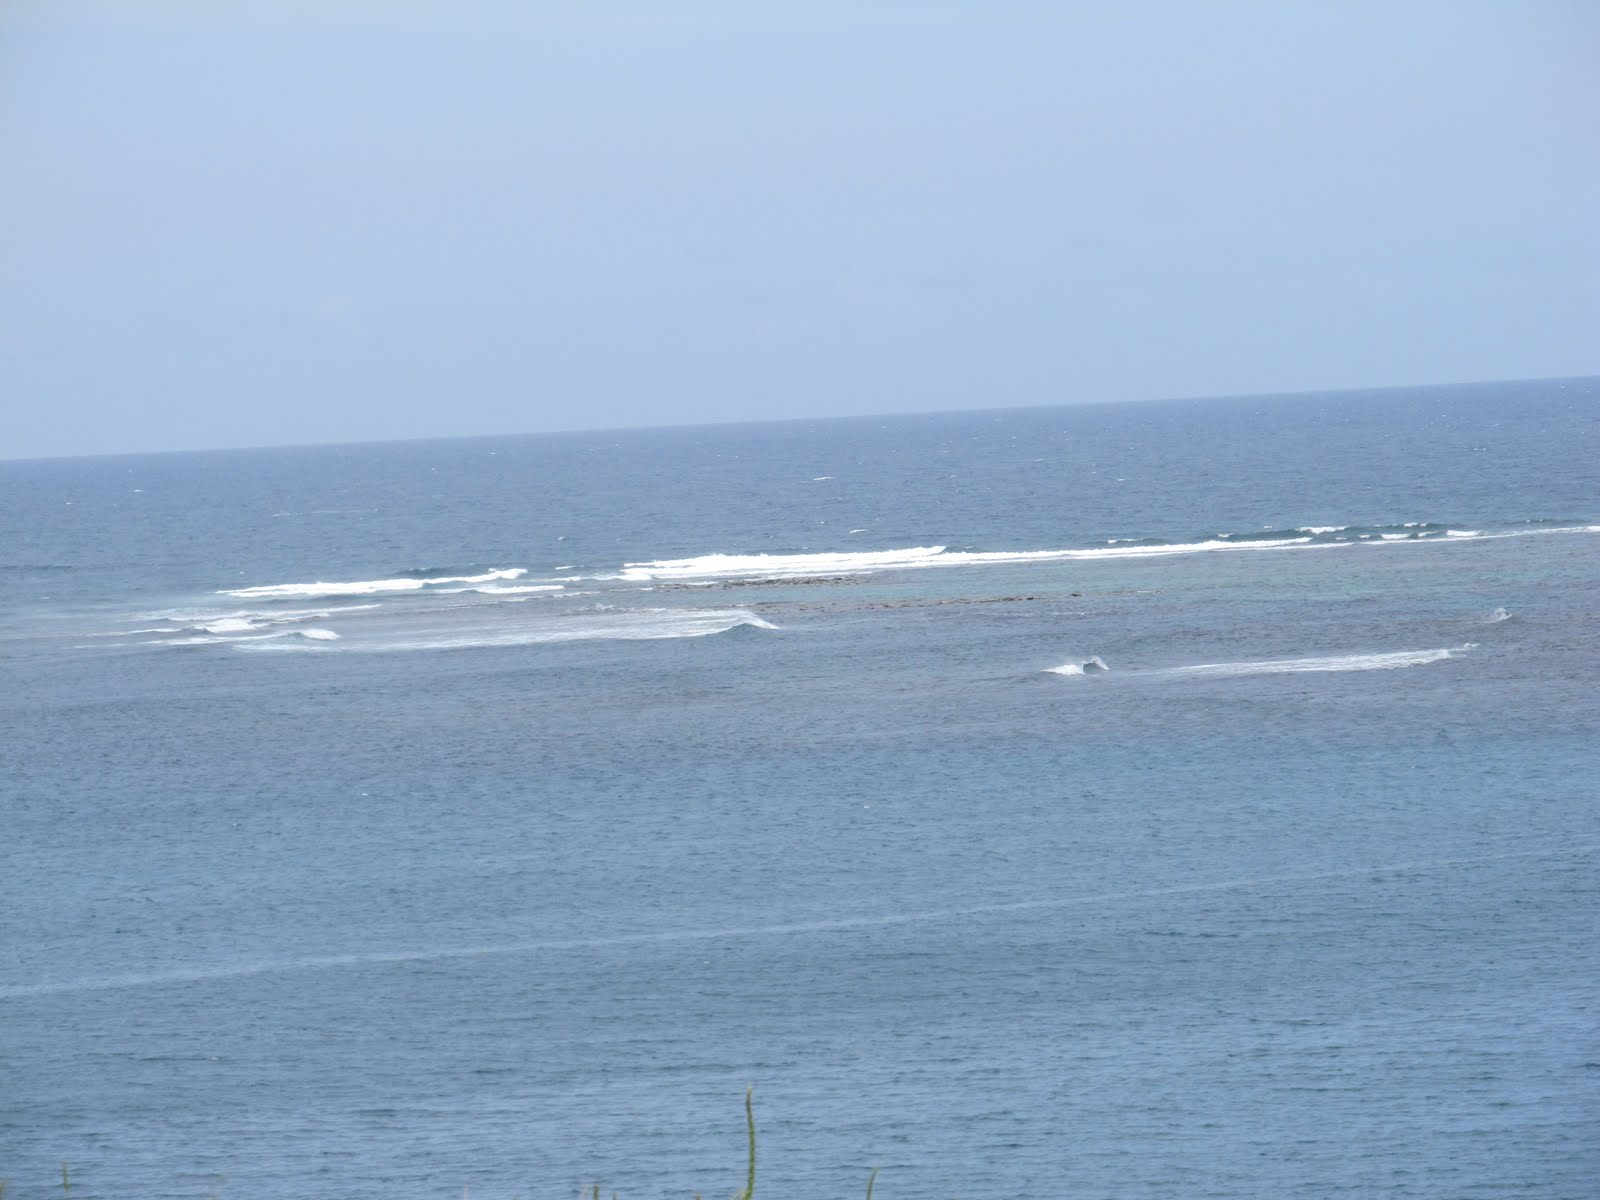 caribbean and atlantic ocean meet